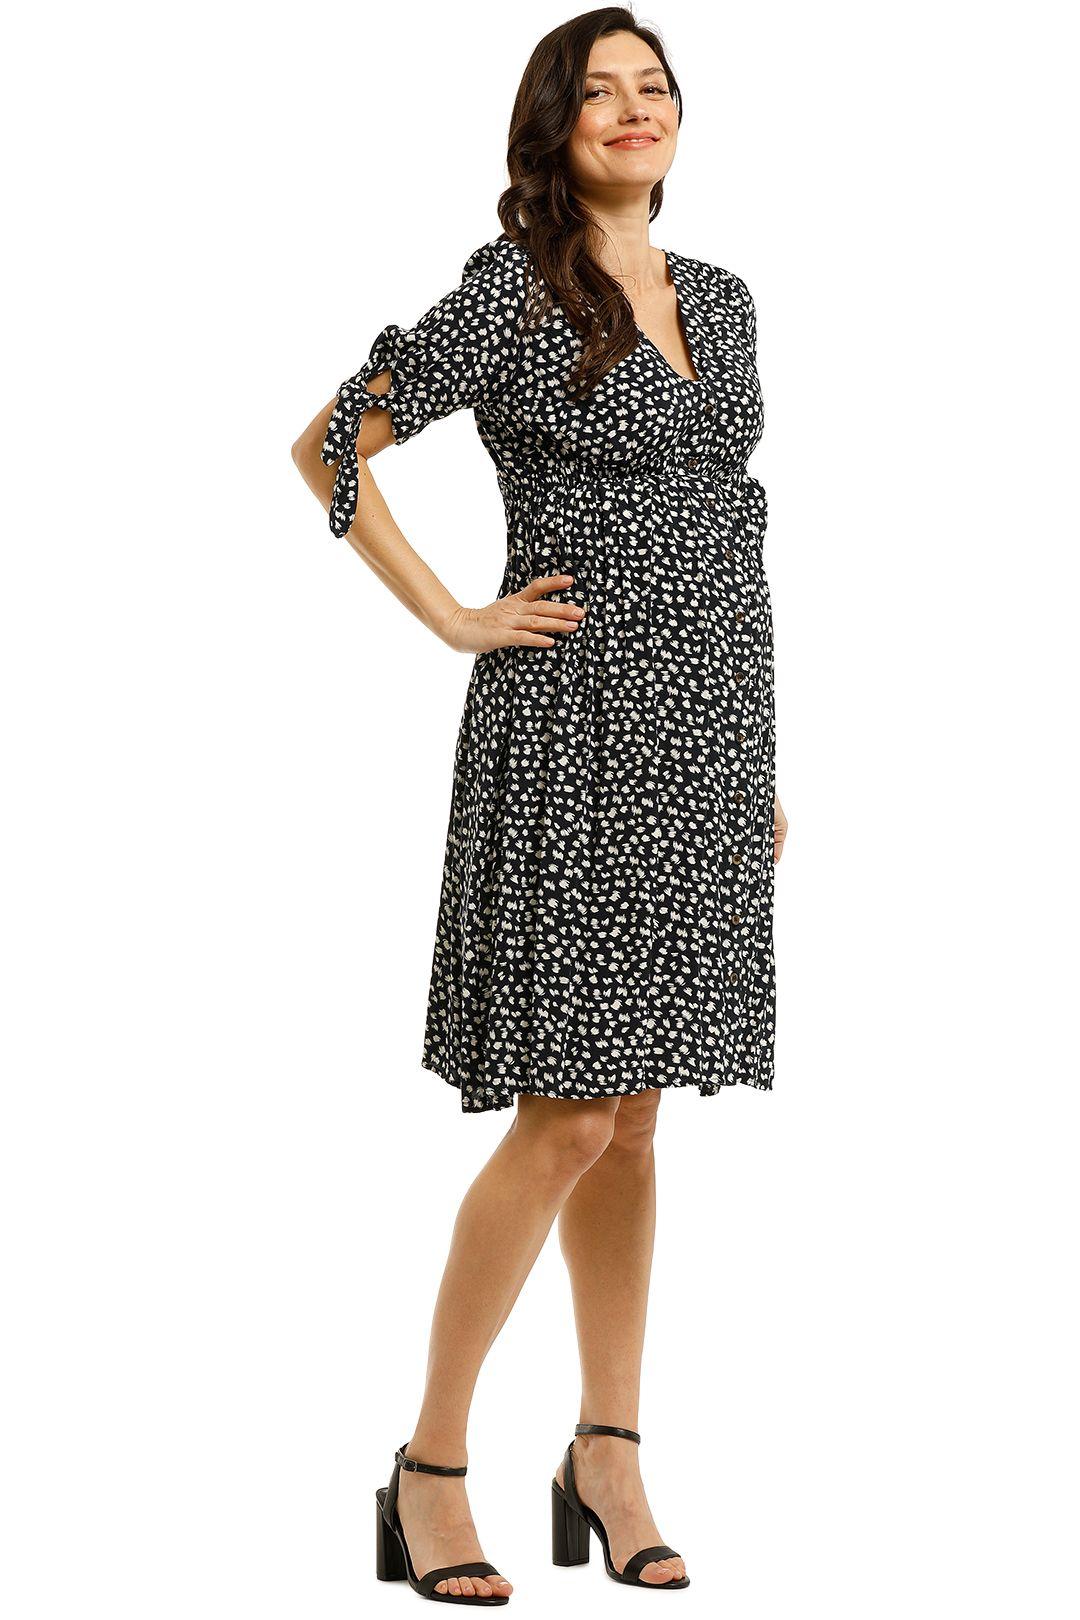 Soon-Maternity-Zippi-Dress-Navy-Speck-Front